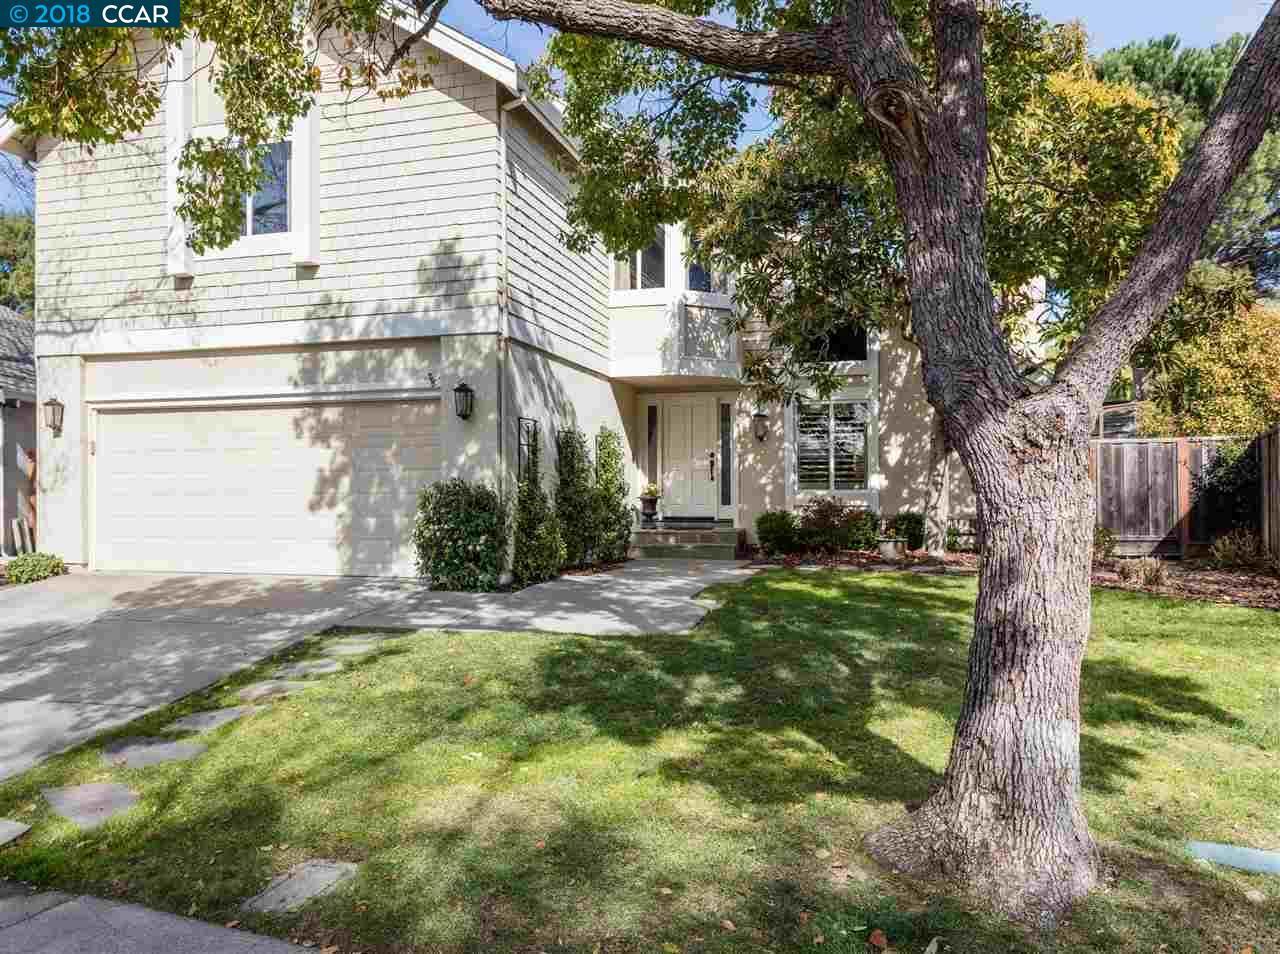 La Casa Via Area Homes For Sale Real Estate Shell Ridge ZipRealty